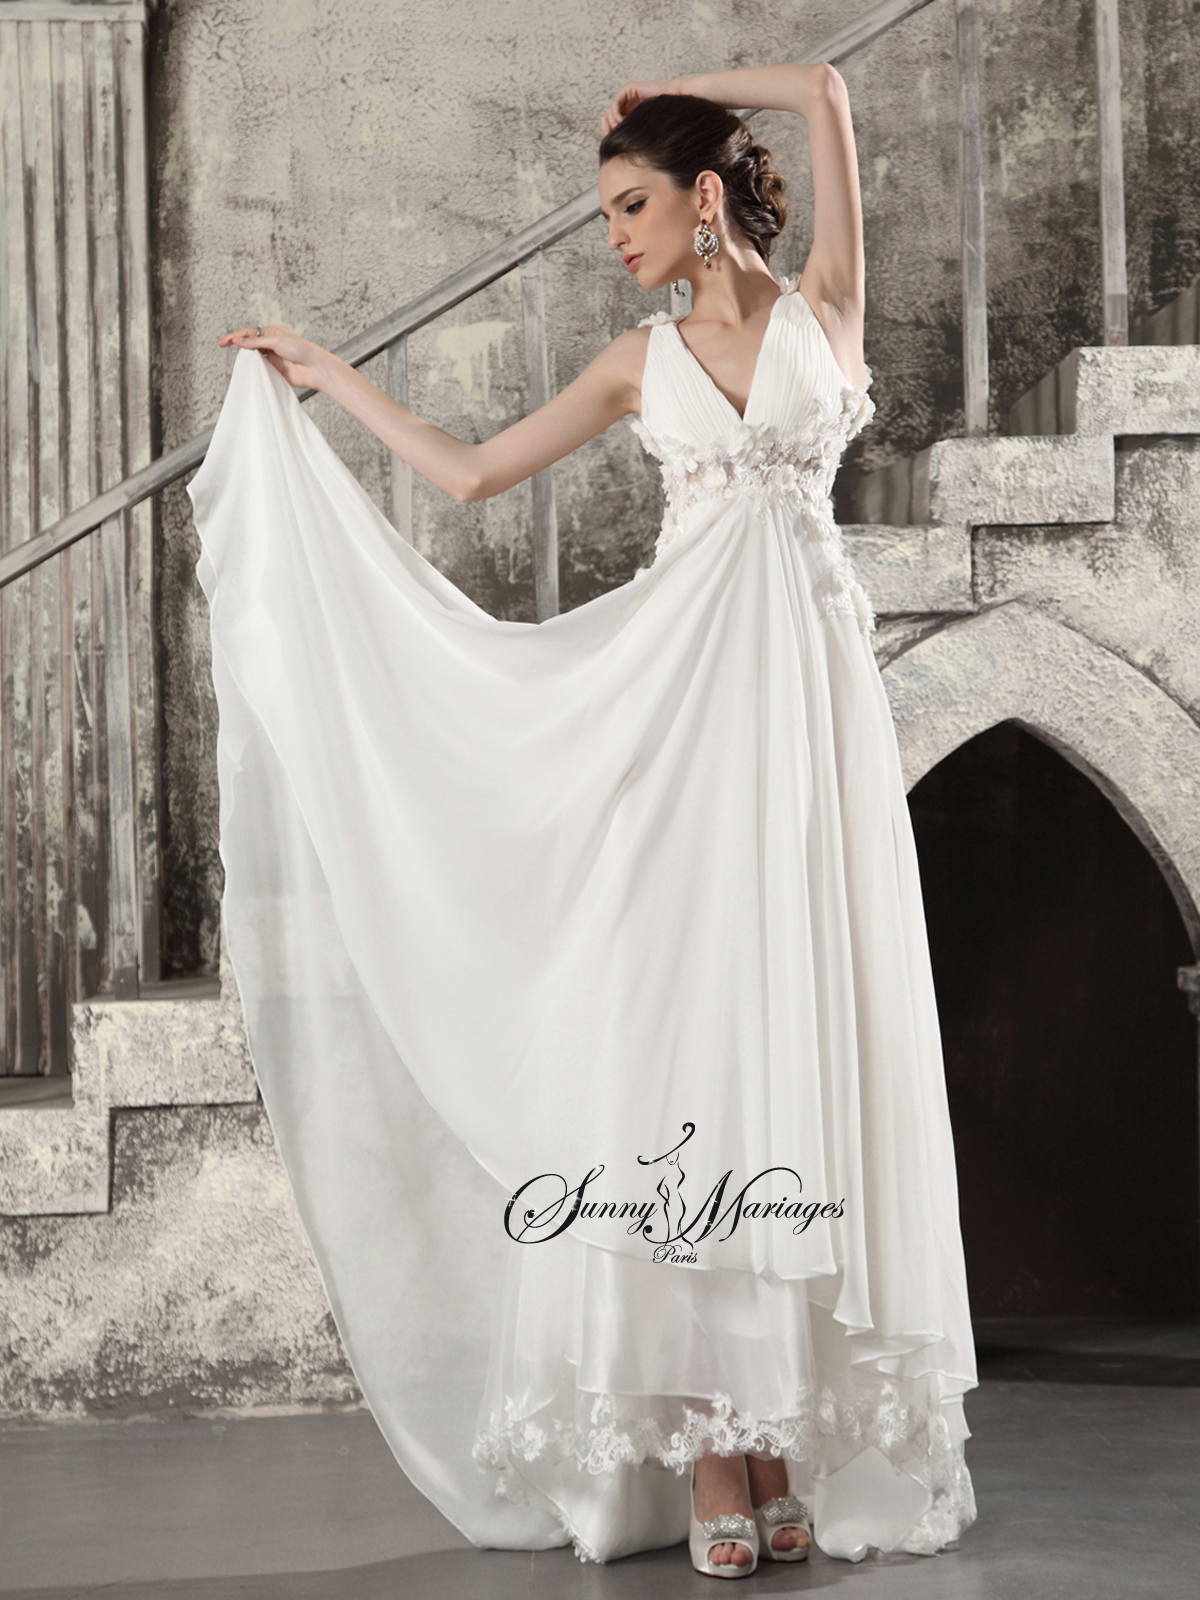 bas prix 68696 4ee96 Robe de mariee empire boheme chic   Sunny Mariage